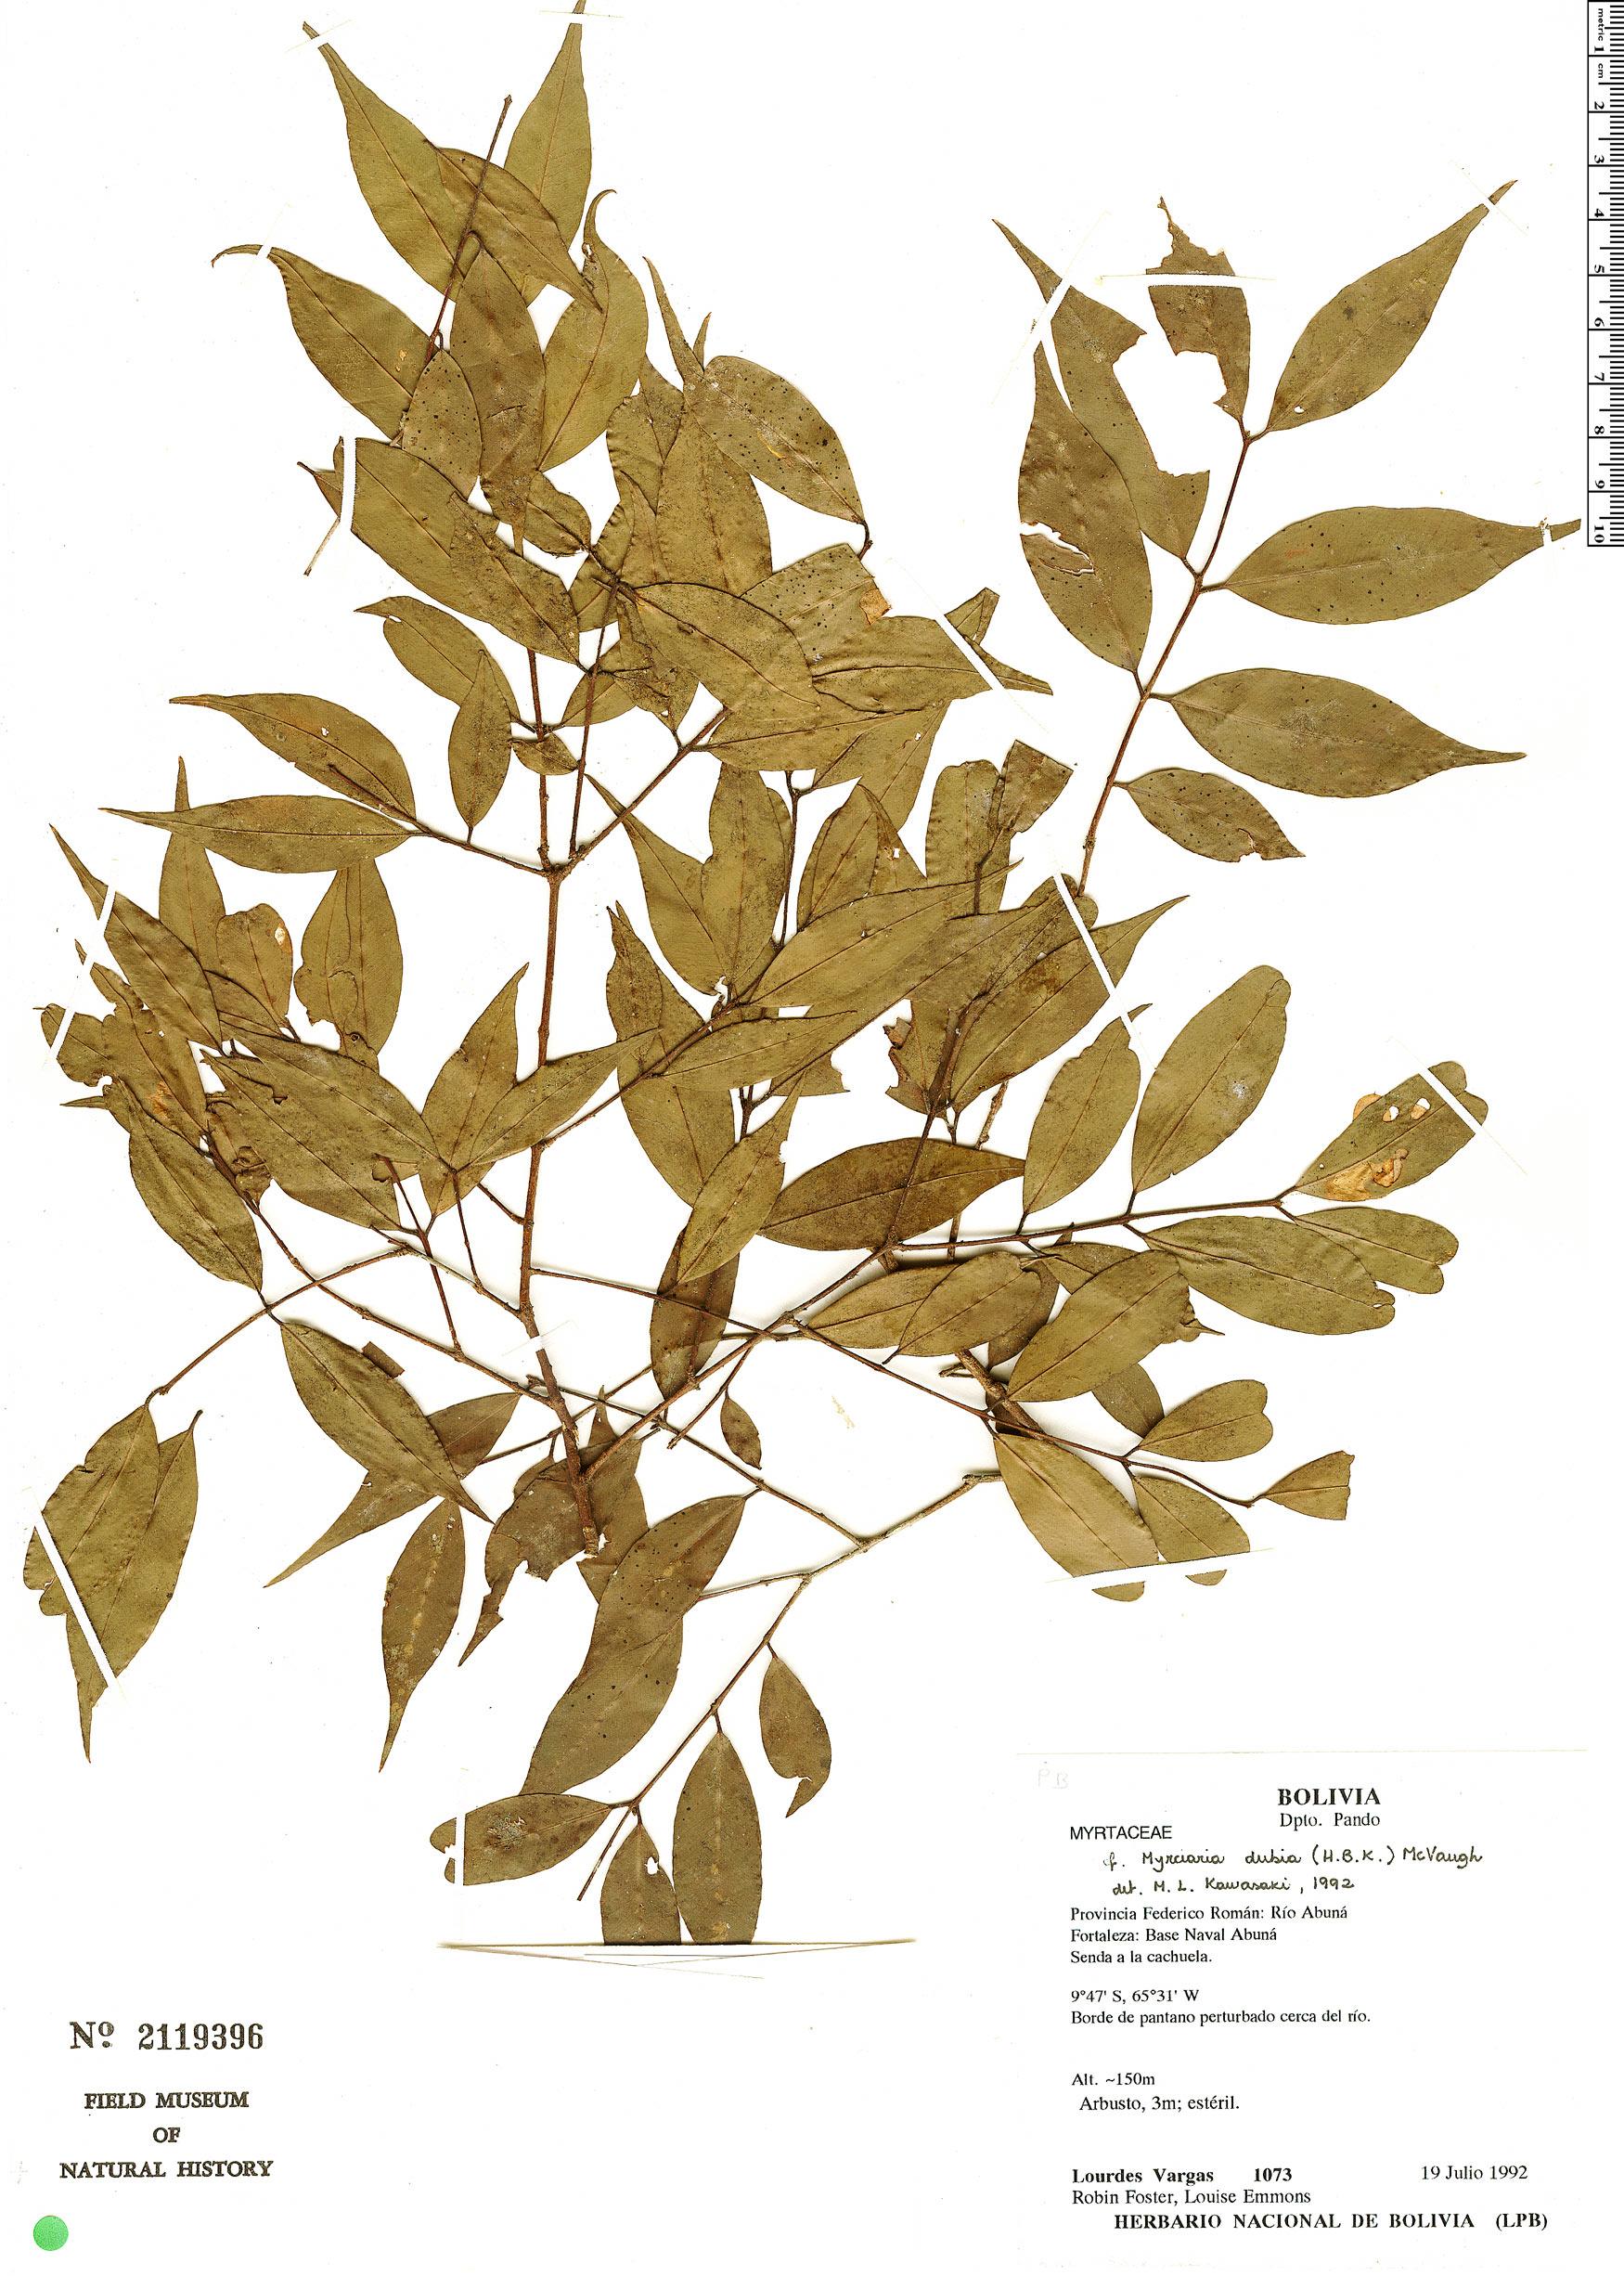 Espécime: Myrciaria dubia